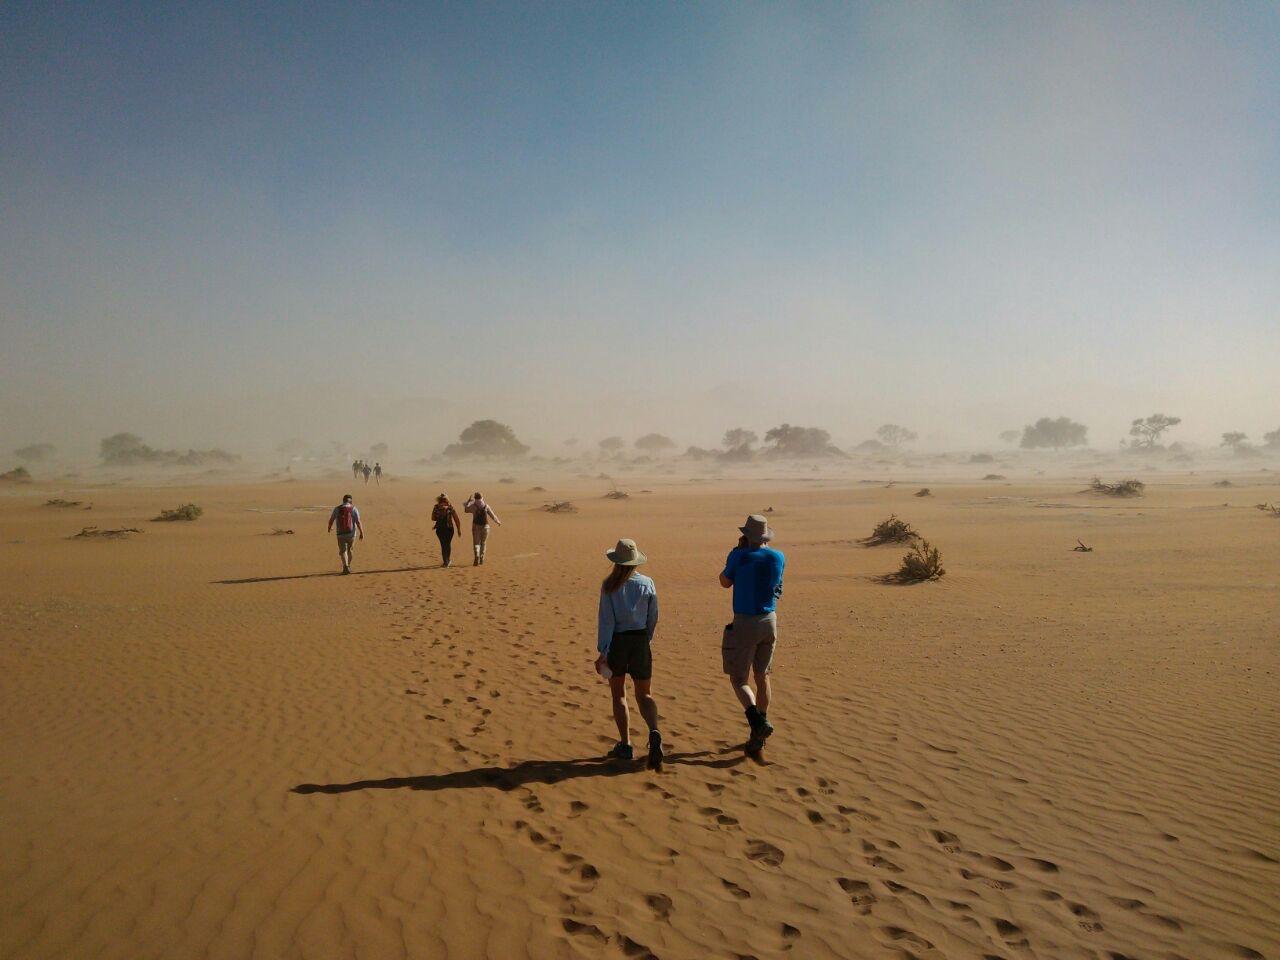 Making footprints in the Namibian desert.